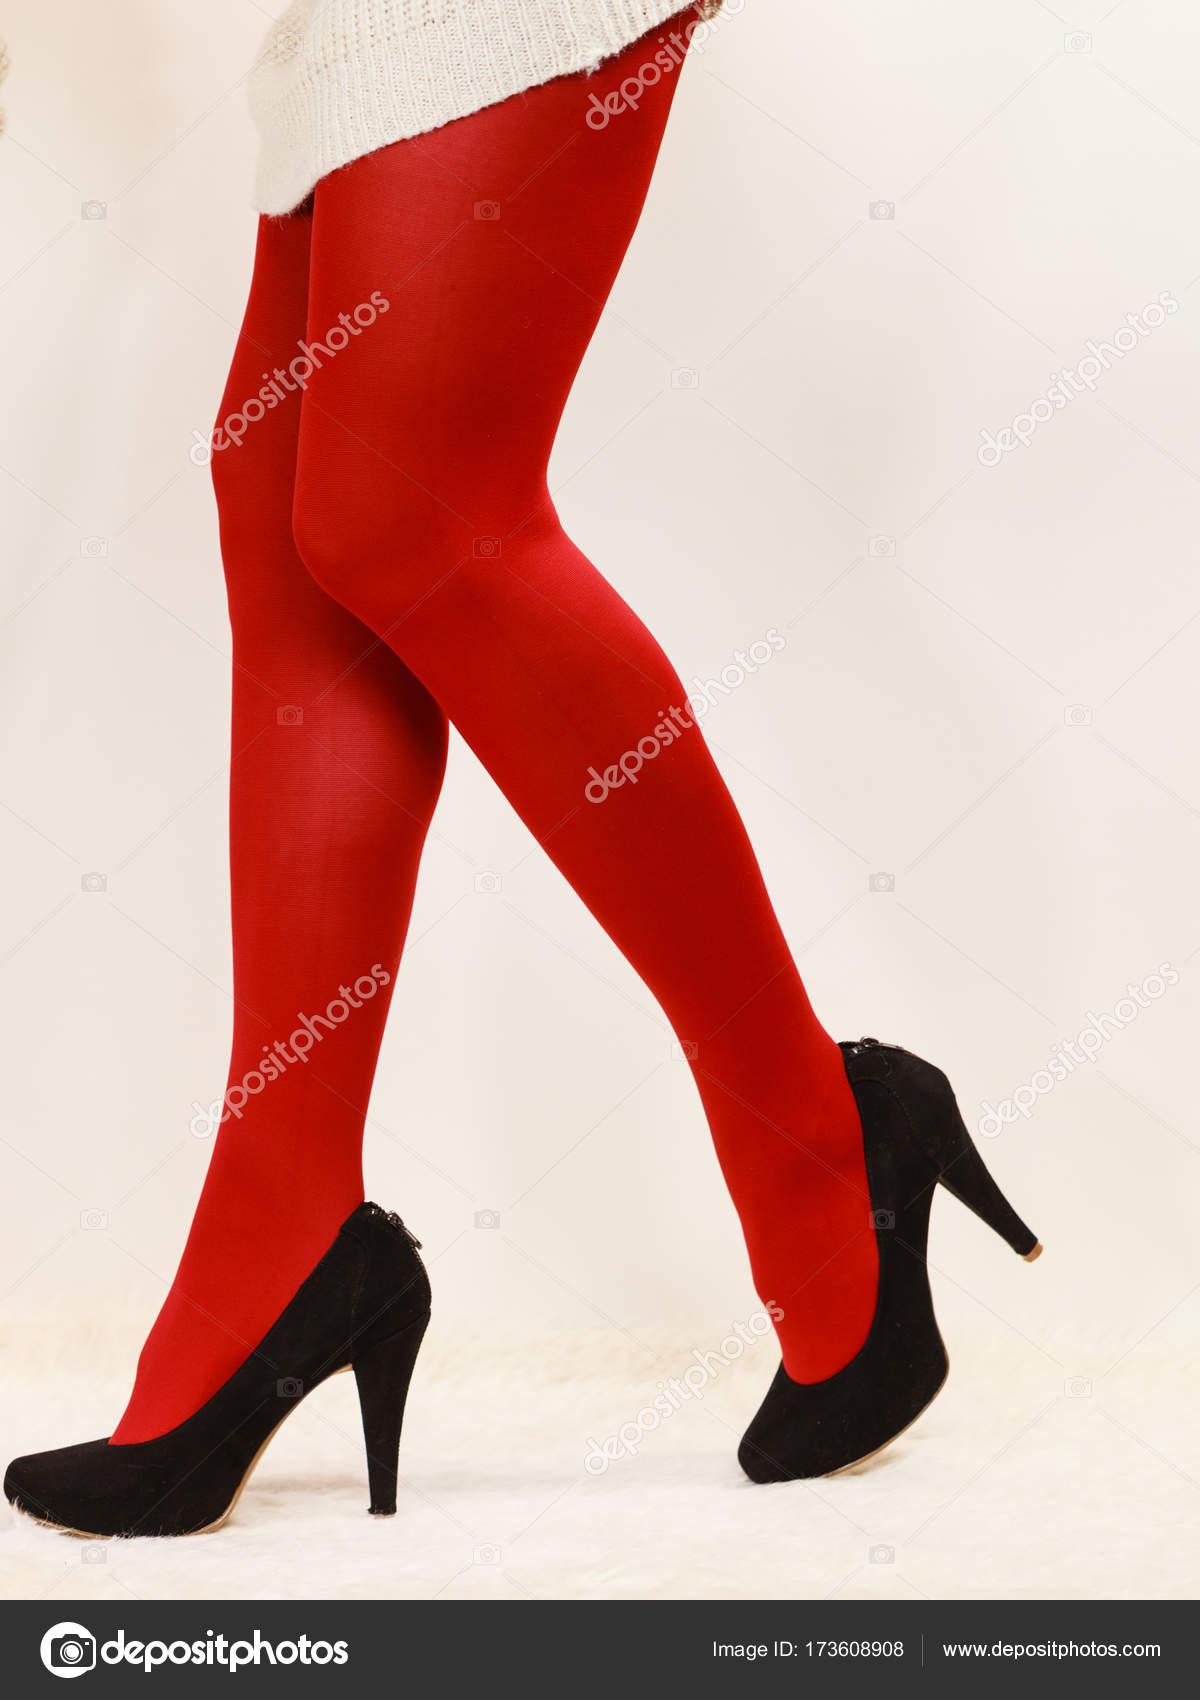 free-pantyhose-and-red-heels-big-tit-lesbian